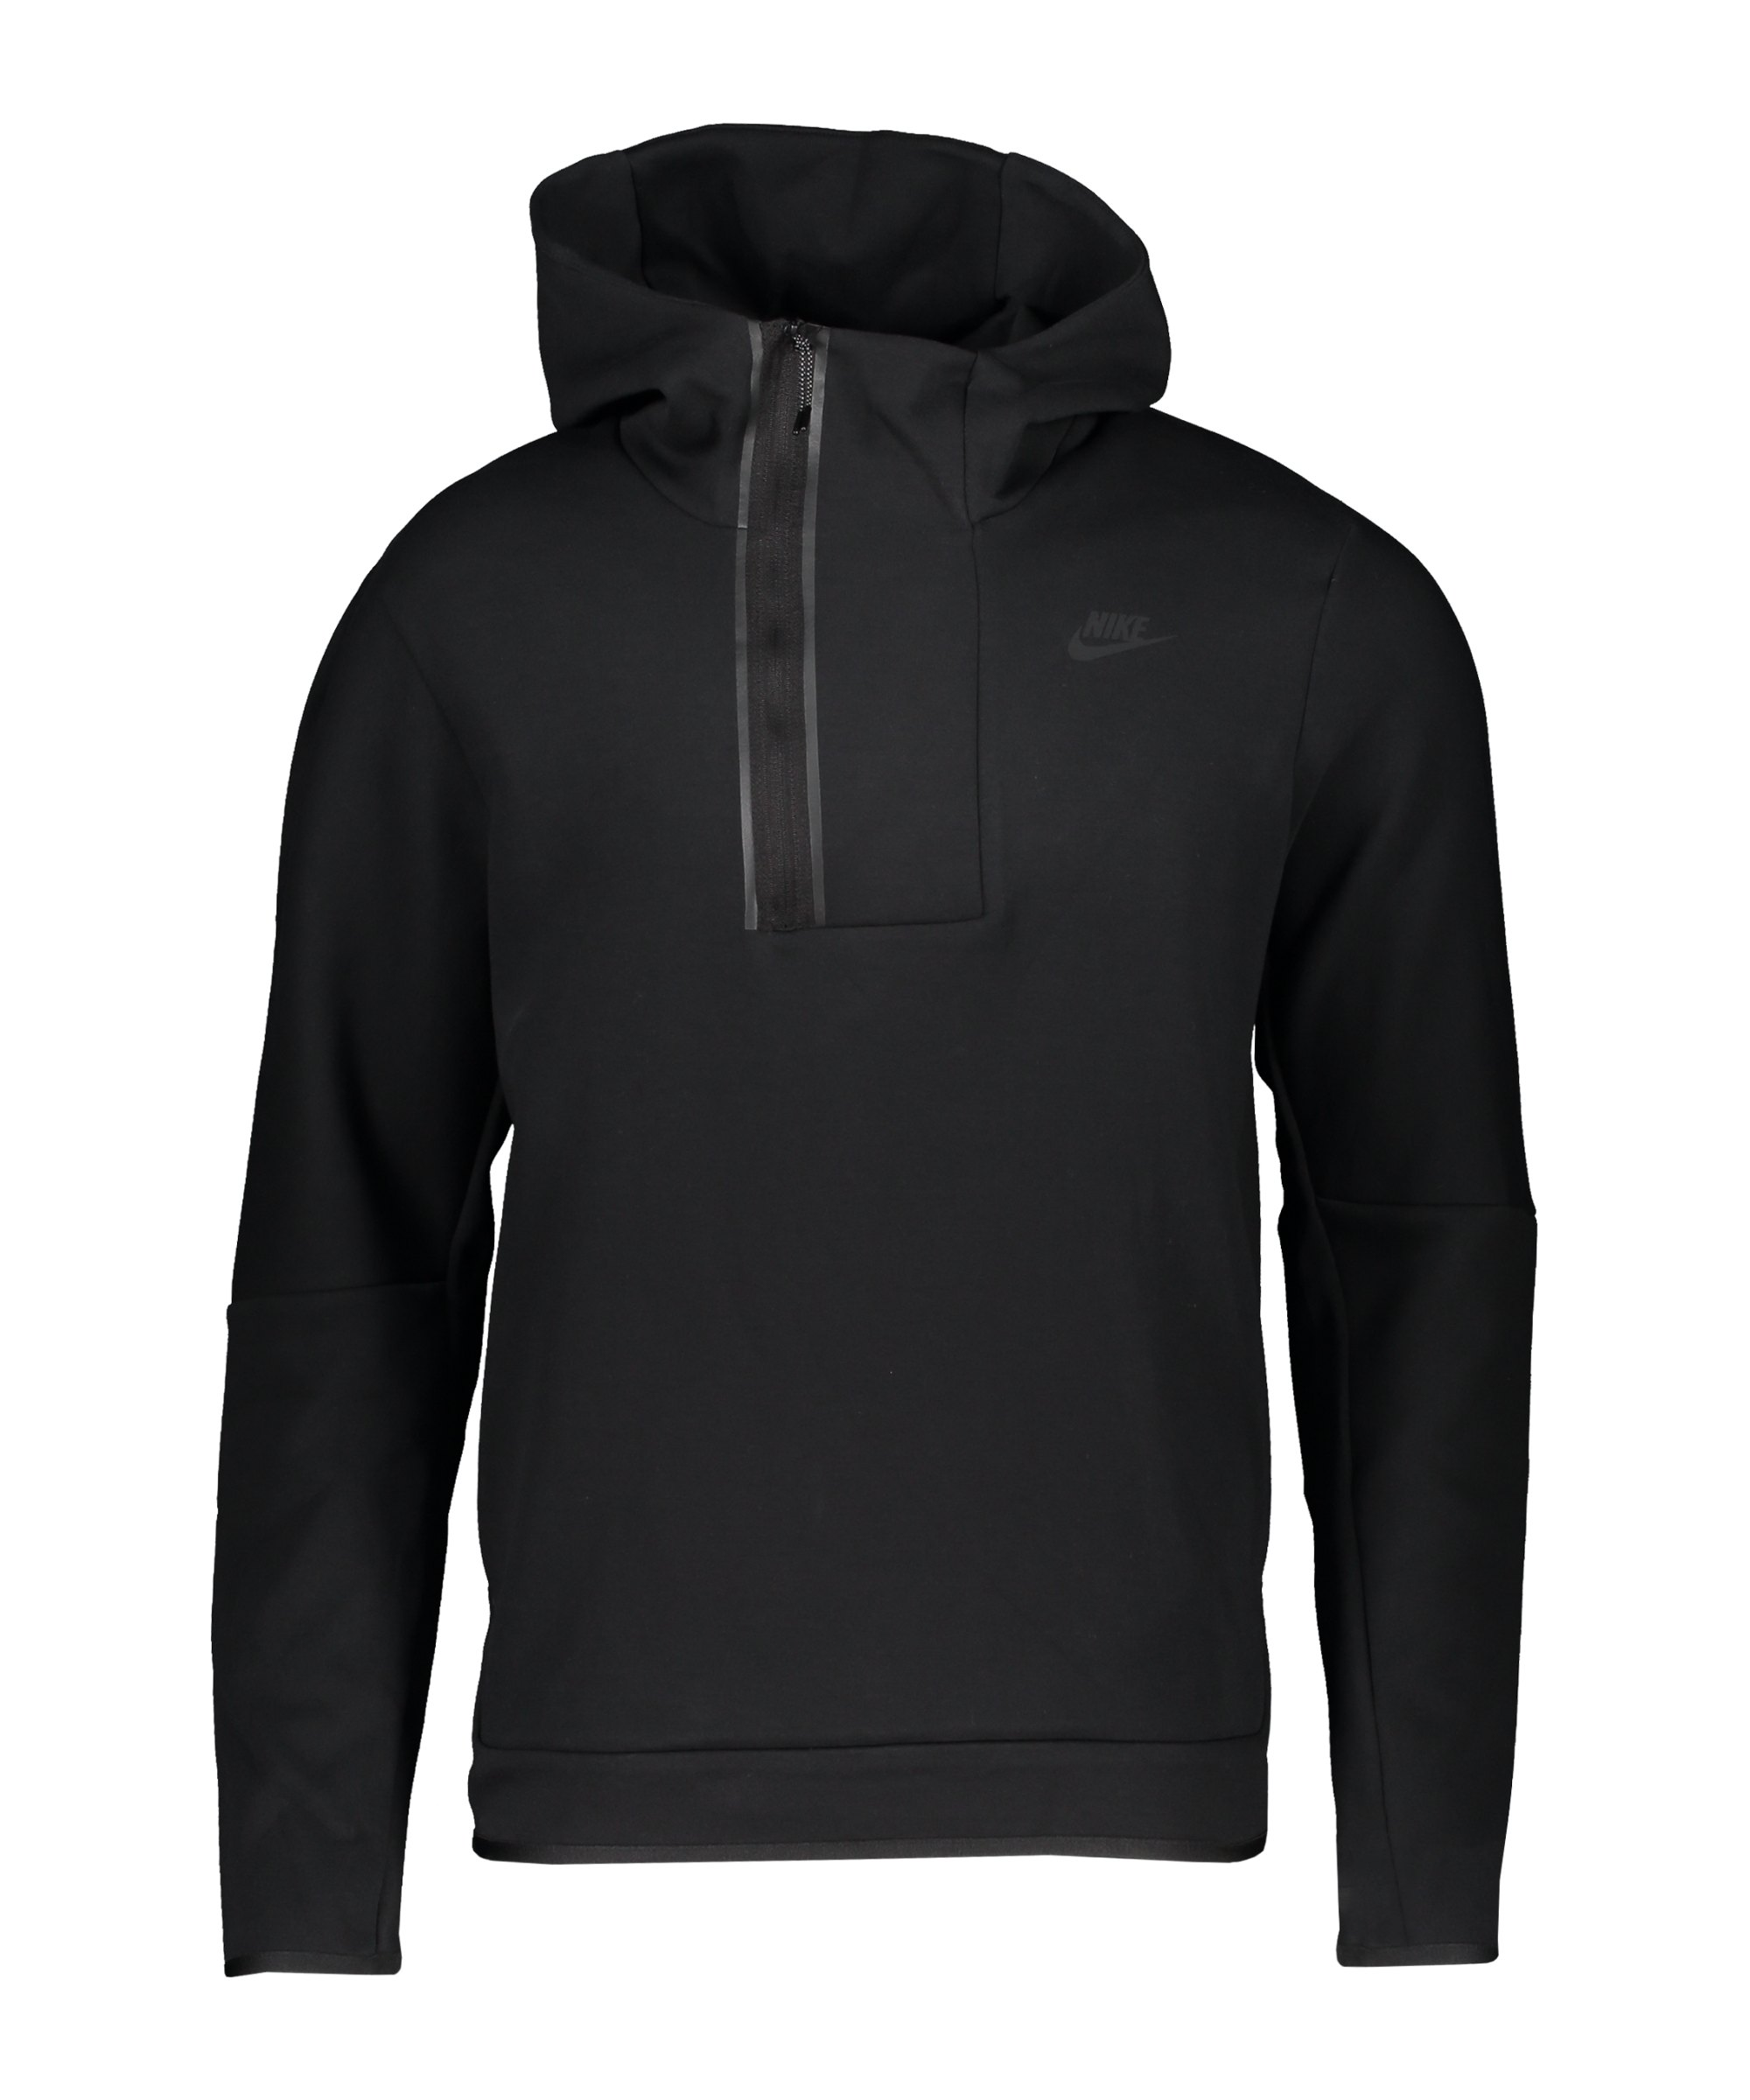 Nike Tech Fleece Crew Sweatshirt Schwarz F010 - schwarz